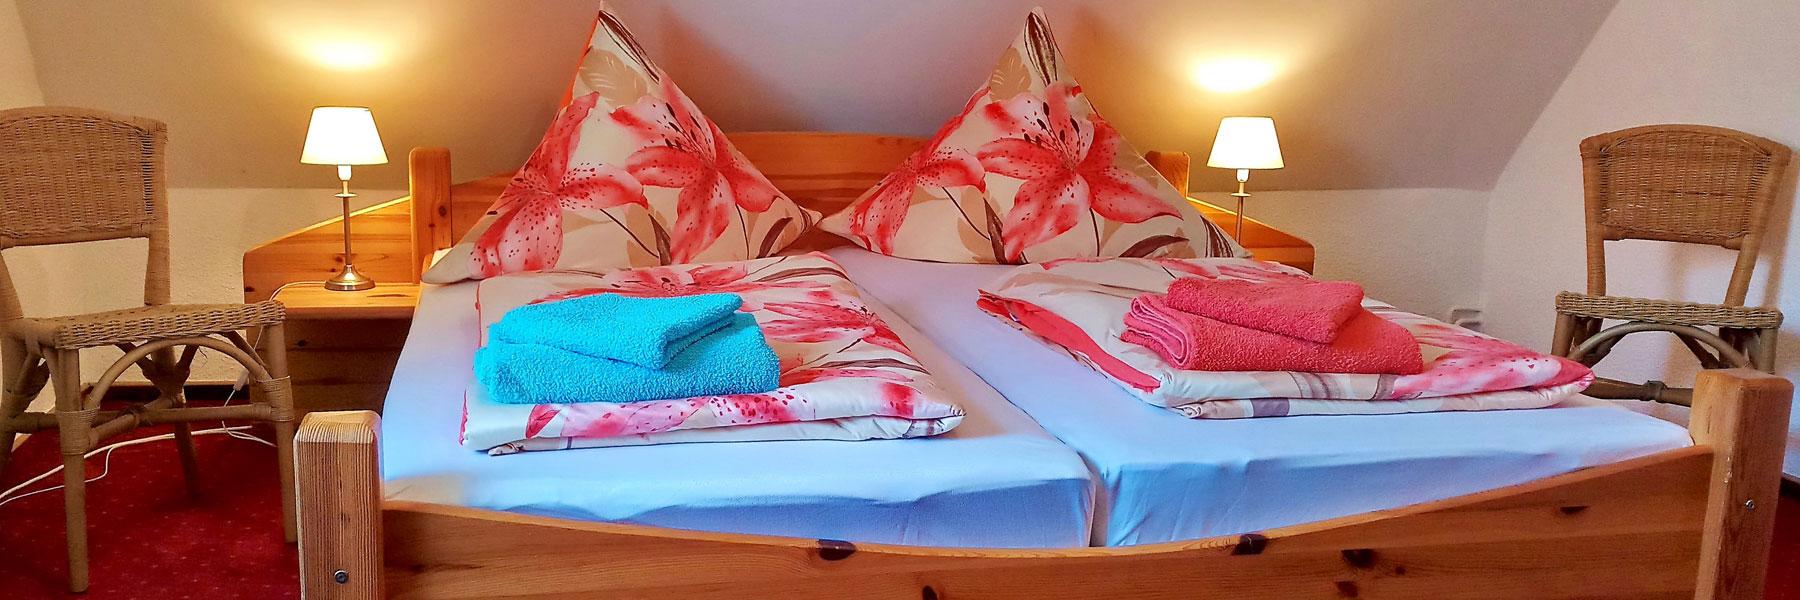 Schlafzimmer - Ferienhaus Lippert